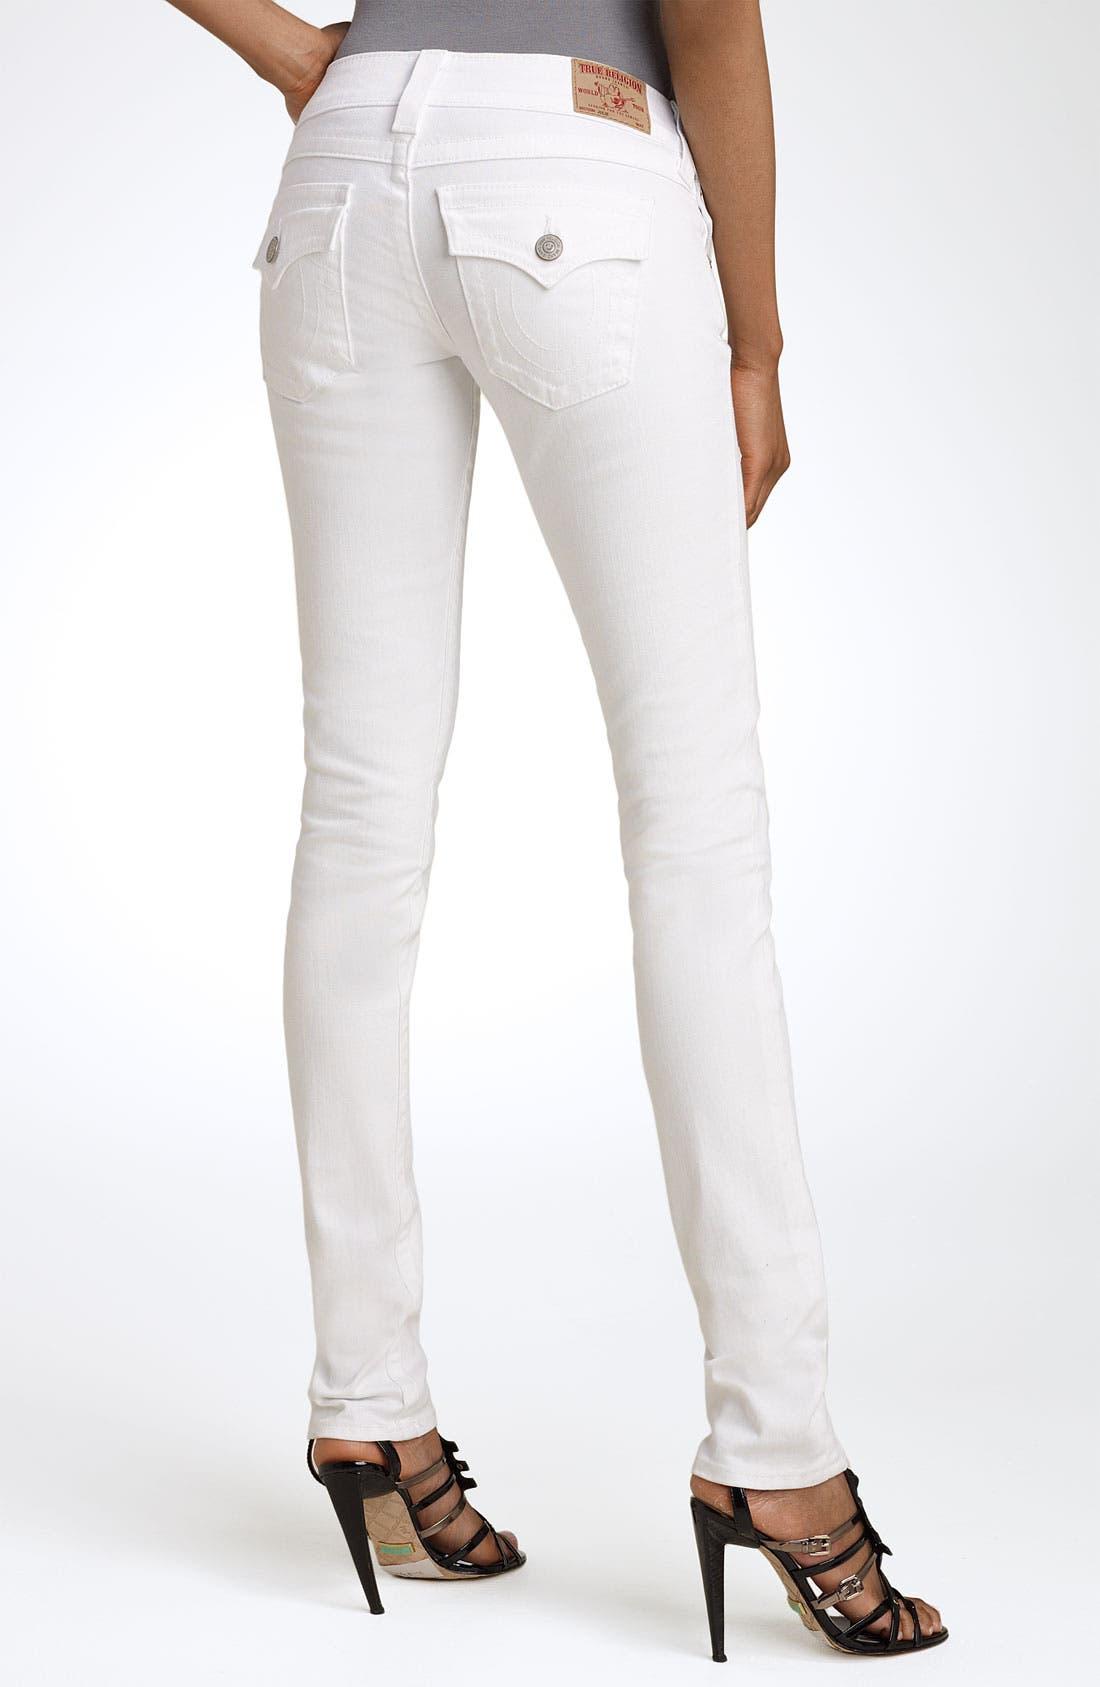 Main Image - True Religion Brand Jeans 'Julie' Skinny Stretch Jeans (Body Rinse White)